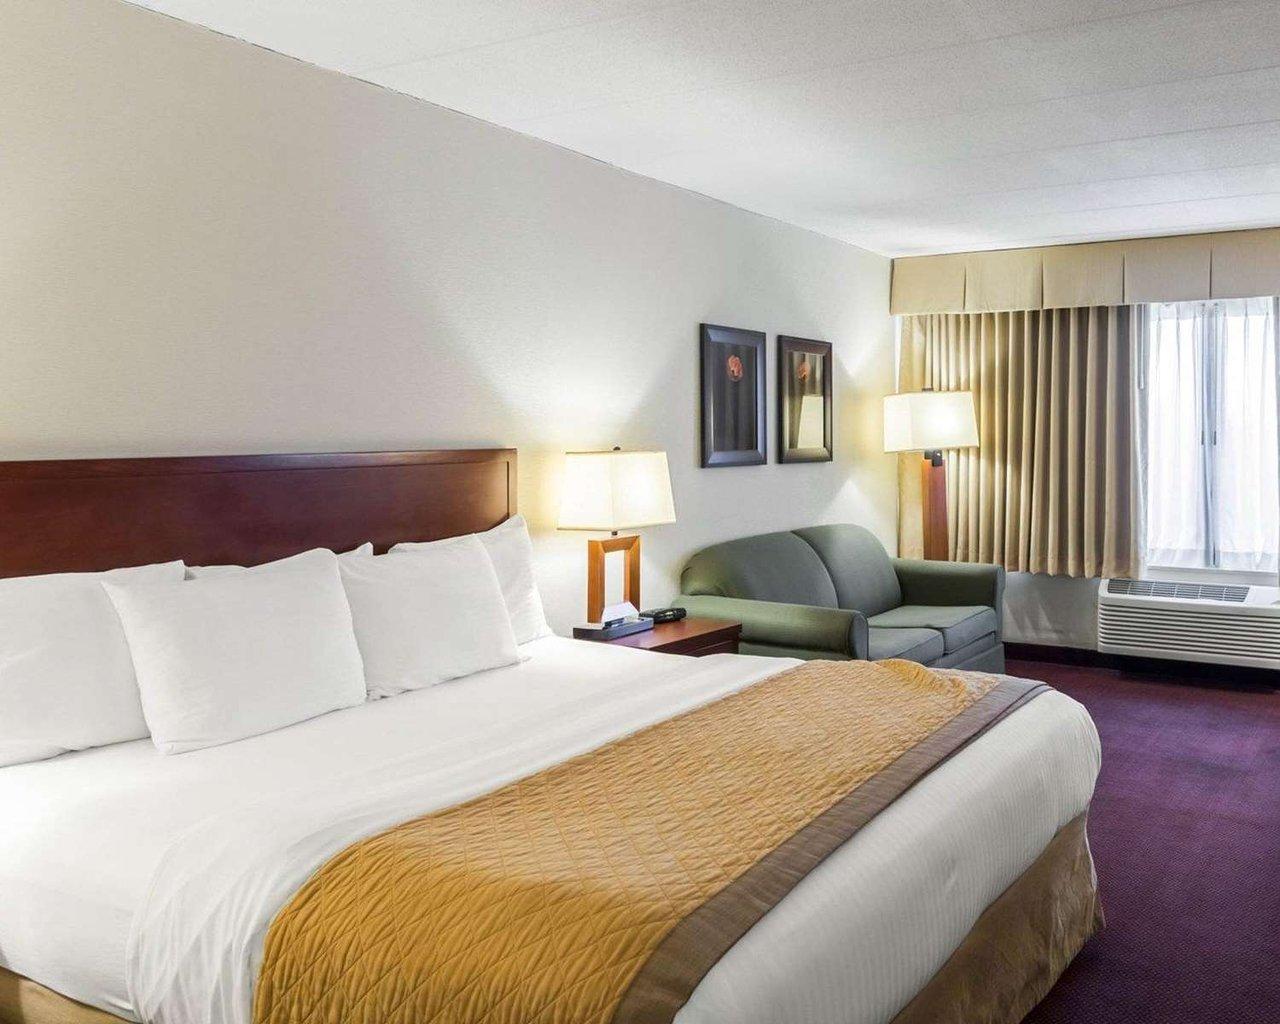 CLARION HOTEL $75 ($̶9̶9̶) - Updated 2019 Prices & Reviews